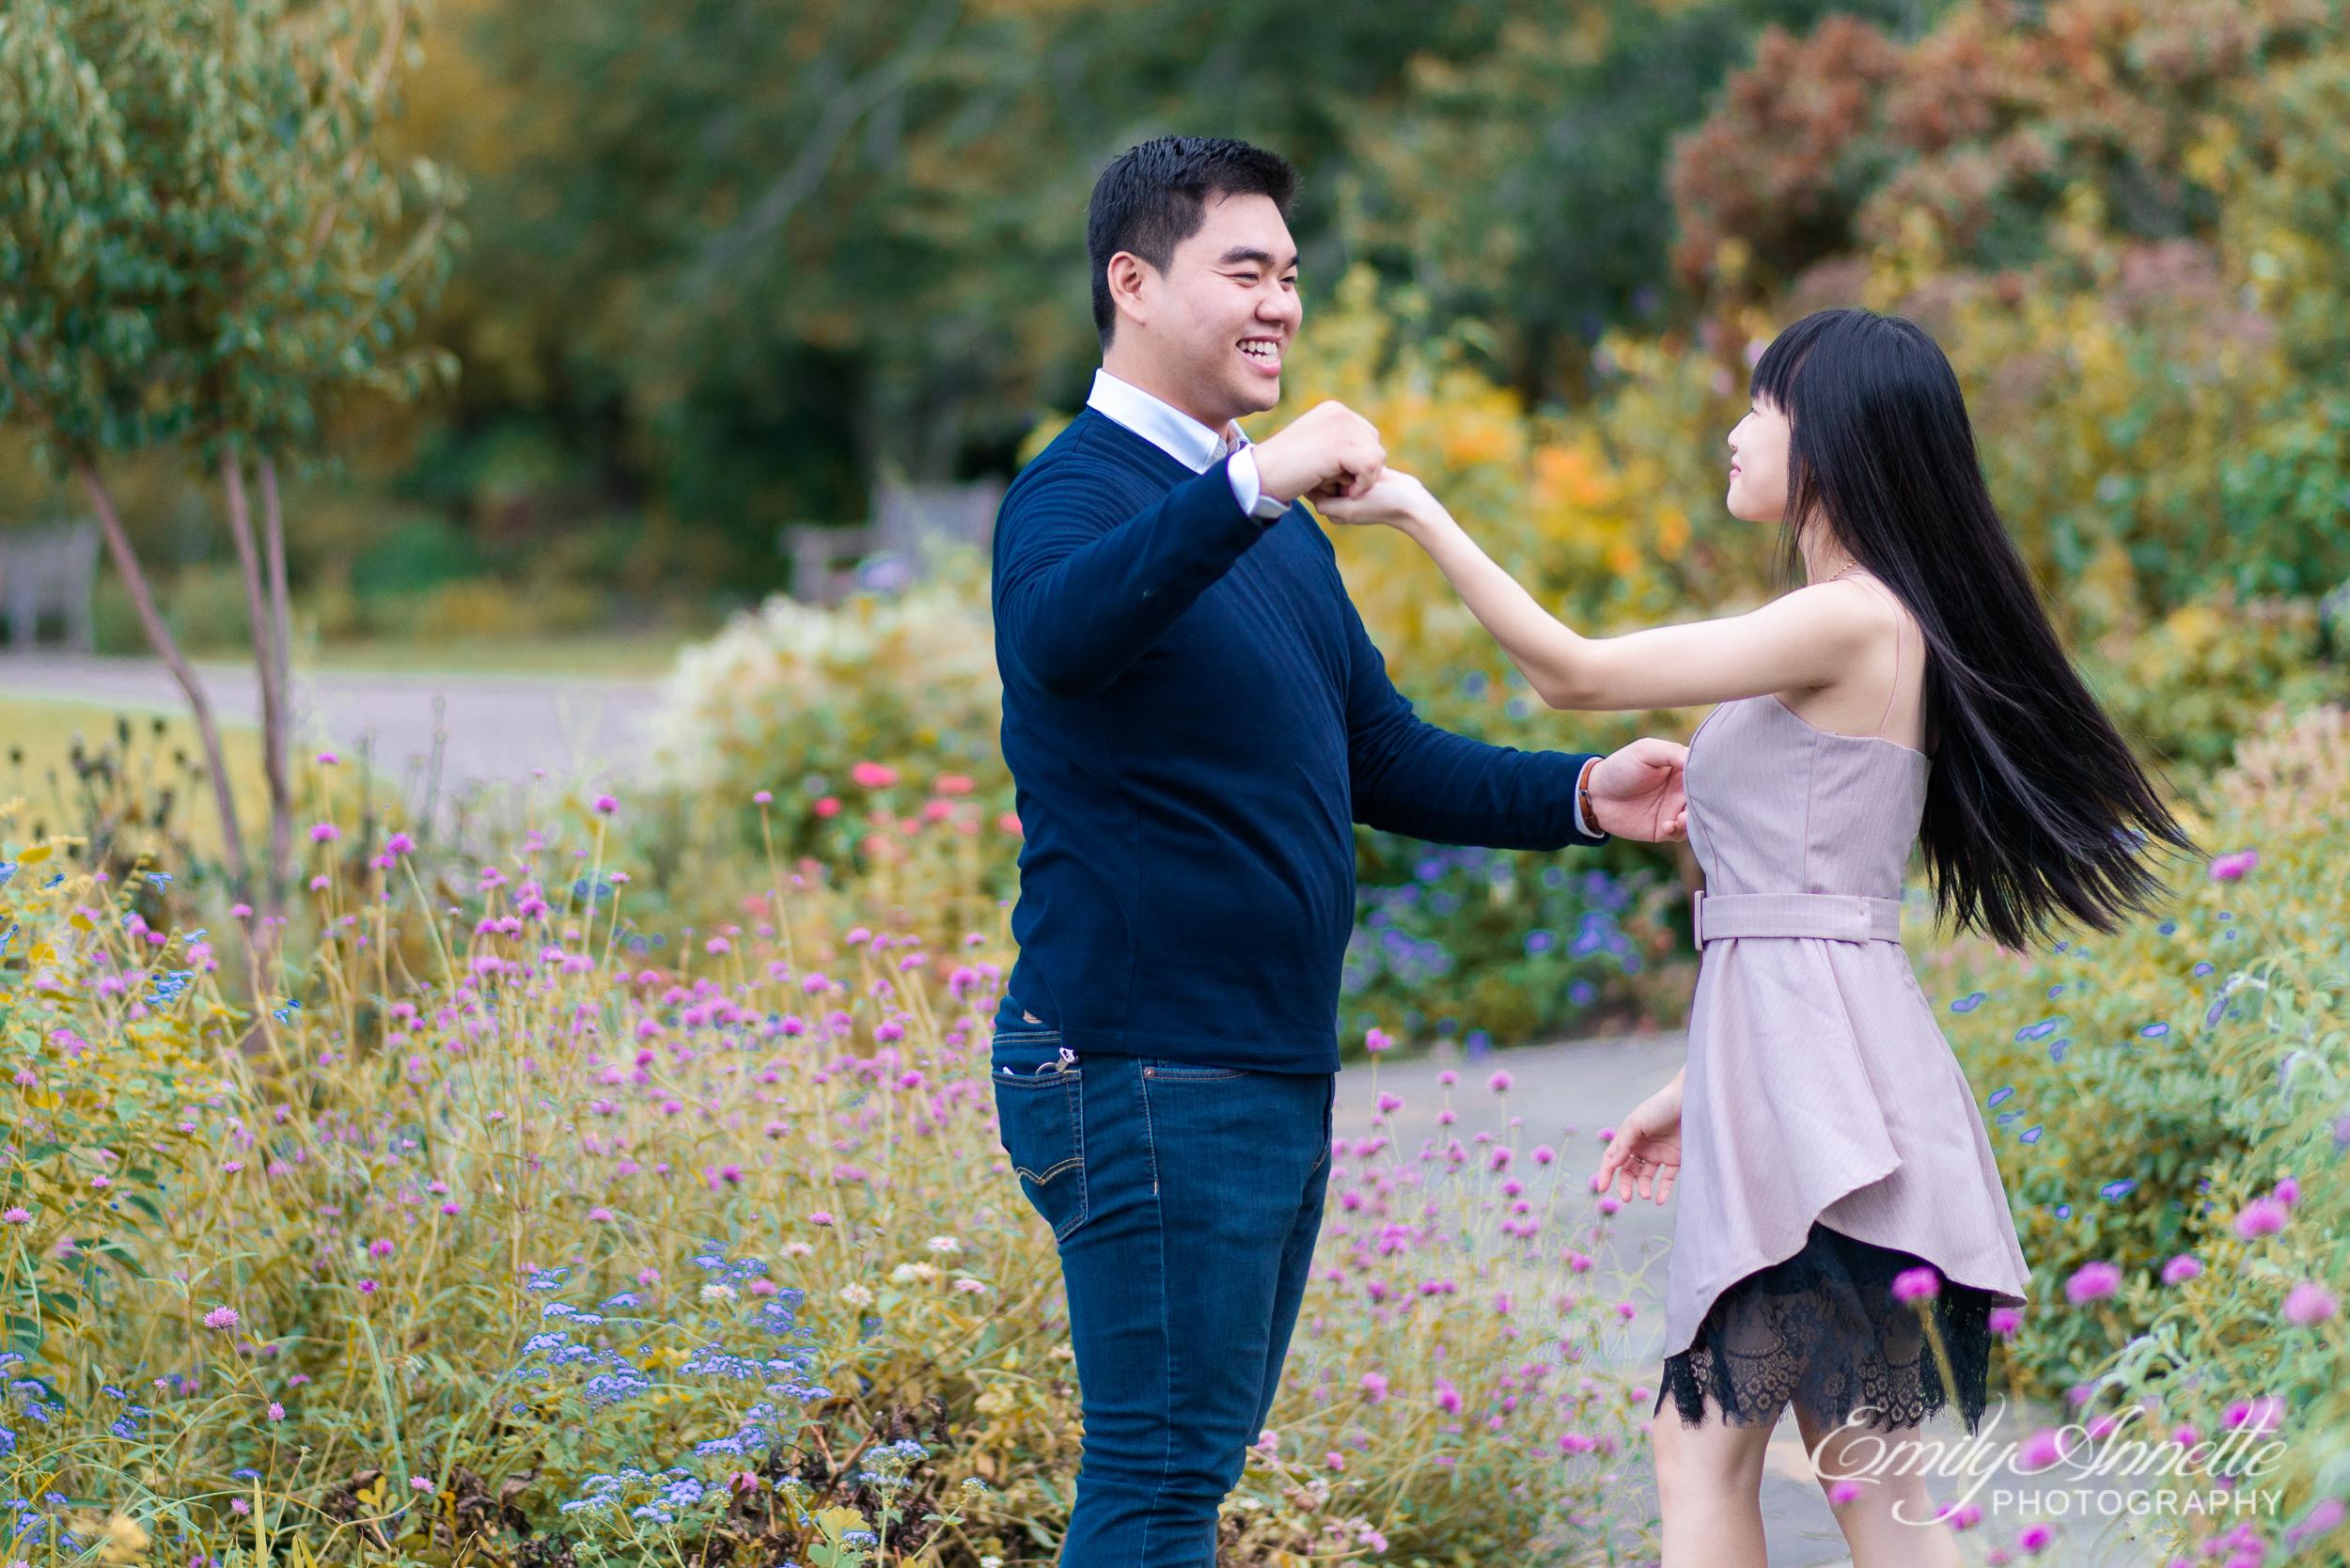 A young couple dance in the gardens at Green Spring Gardens Park in Fairfax, Virginia